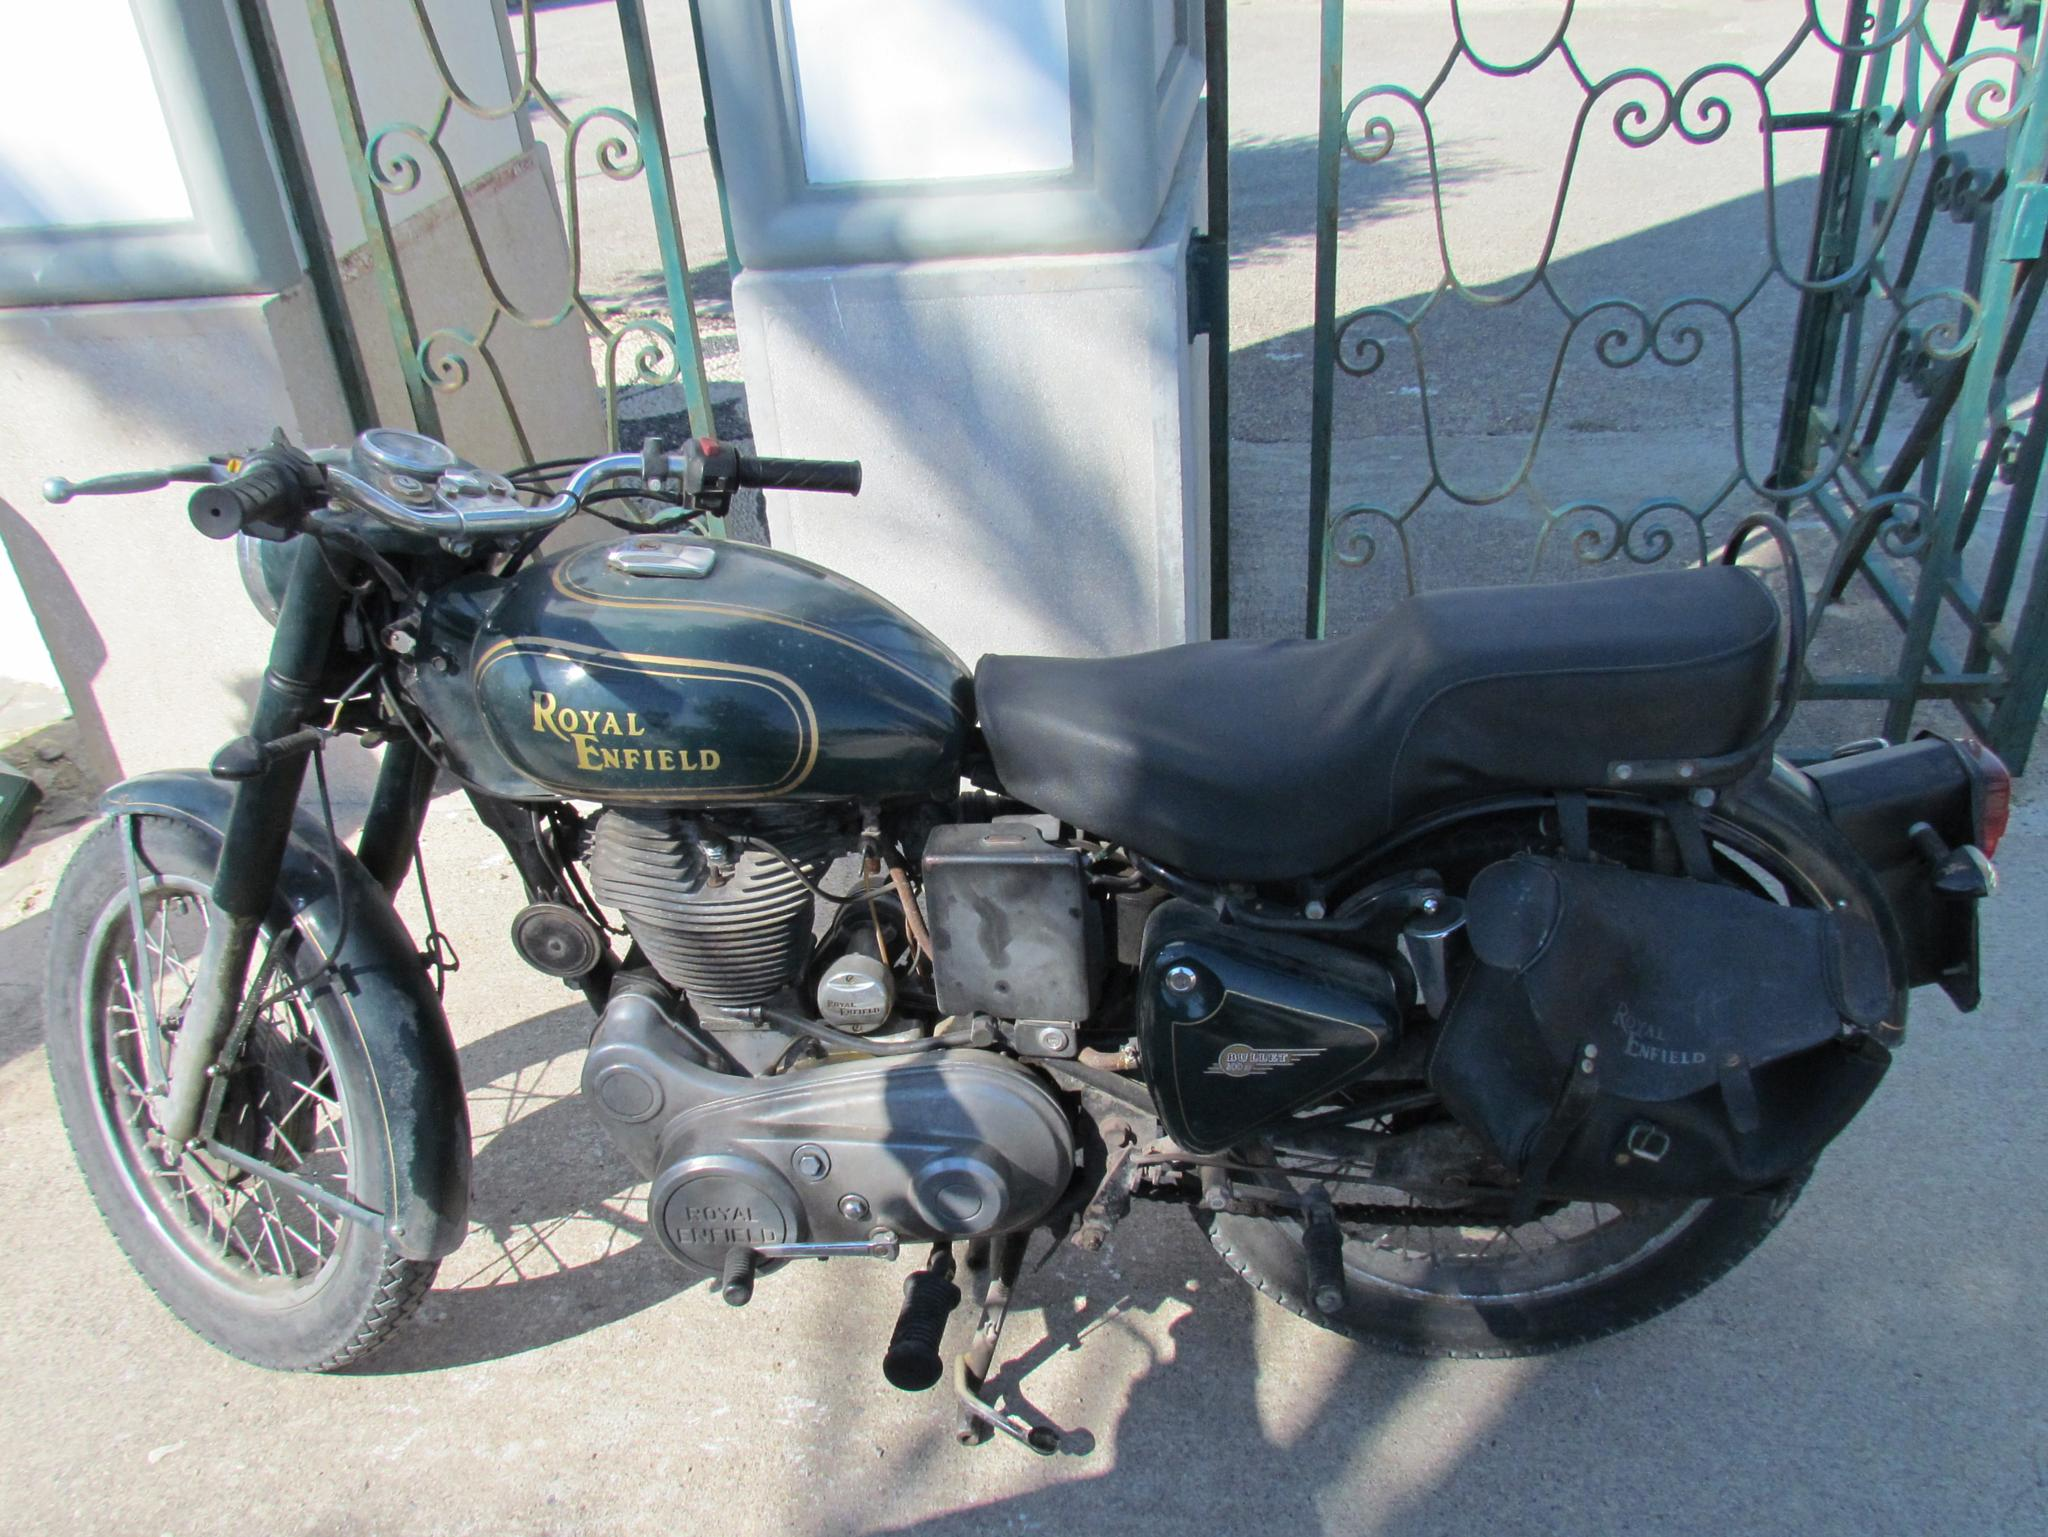 Motor Cycle by Lars M.